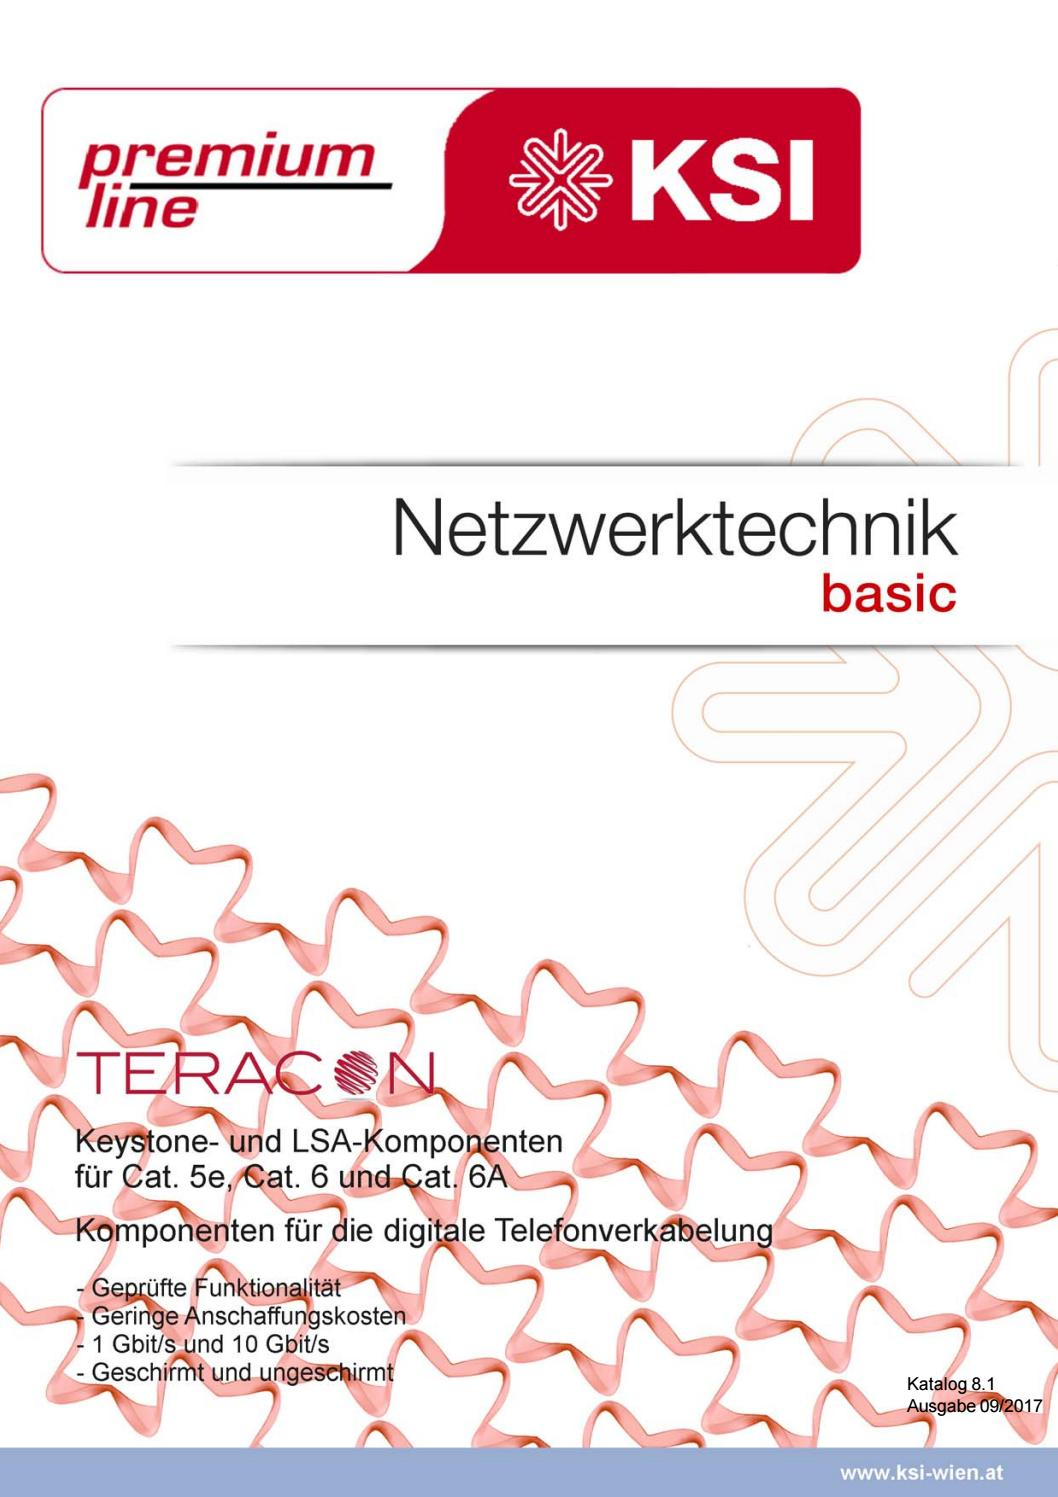 Netzwerktechnik basic (Teracon) by Premium-Line KSI GmbH, Gerald ...